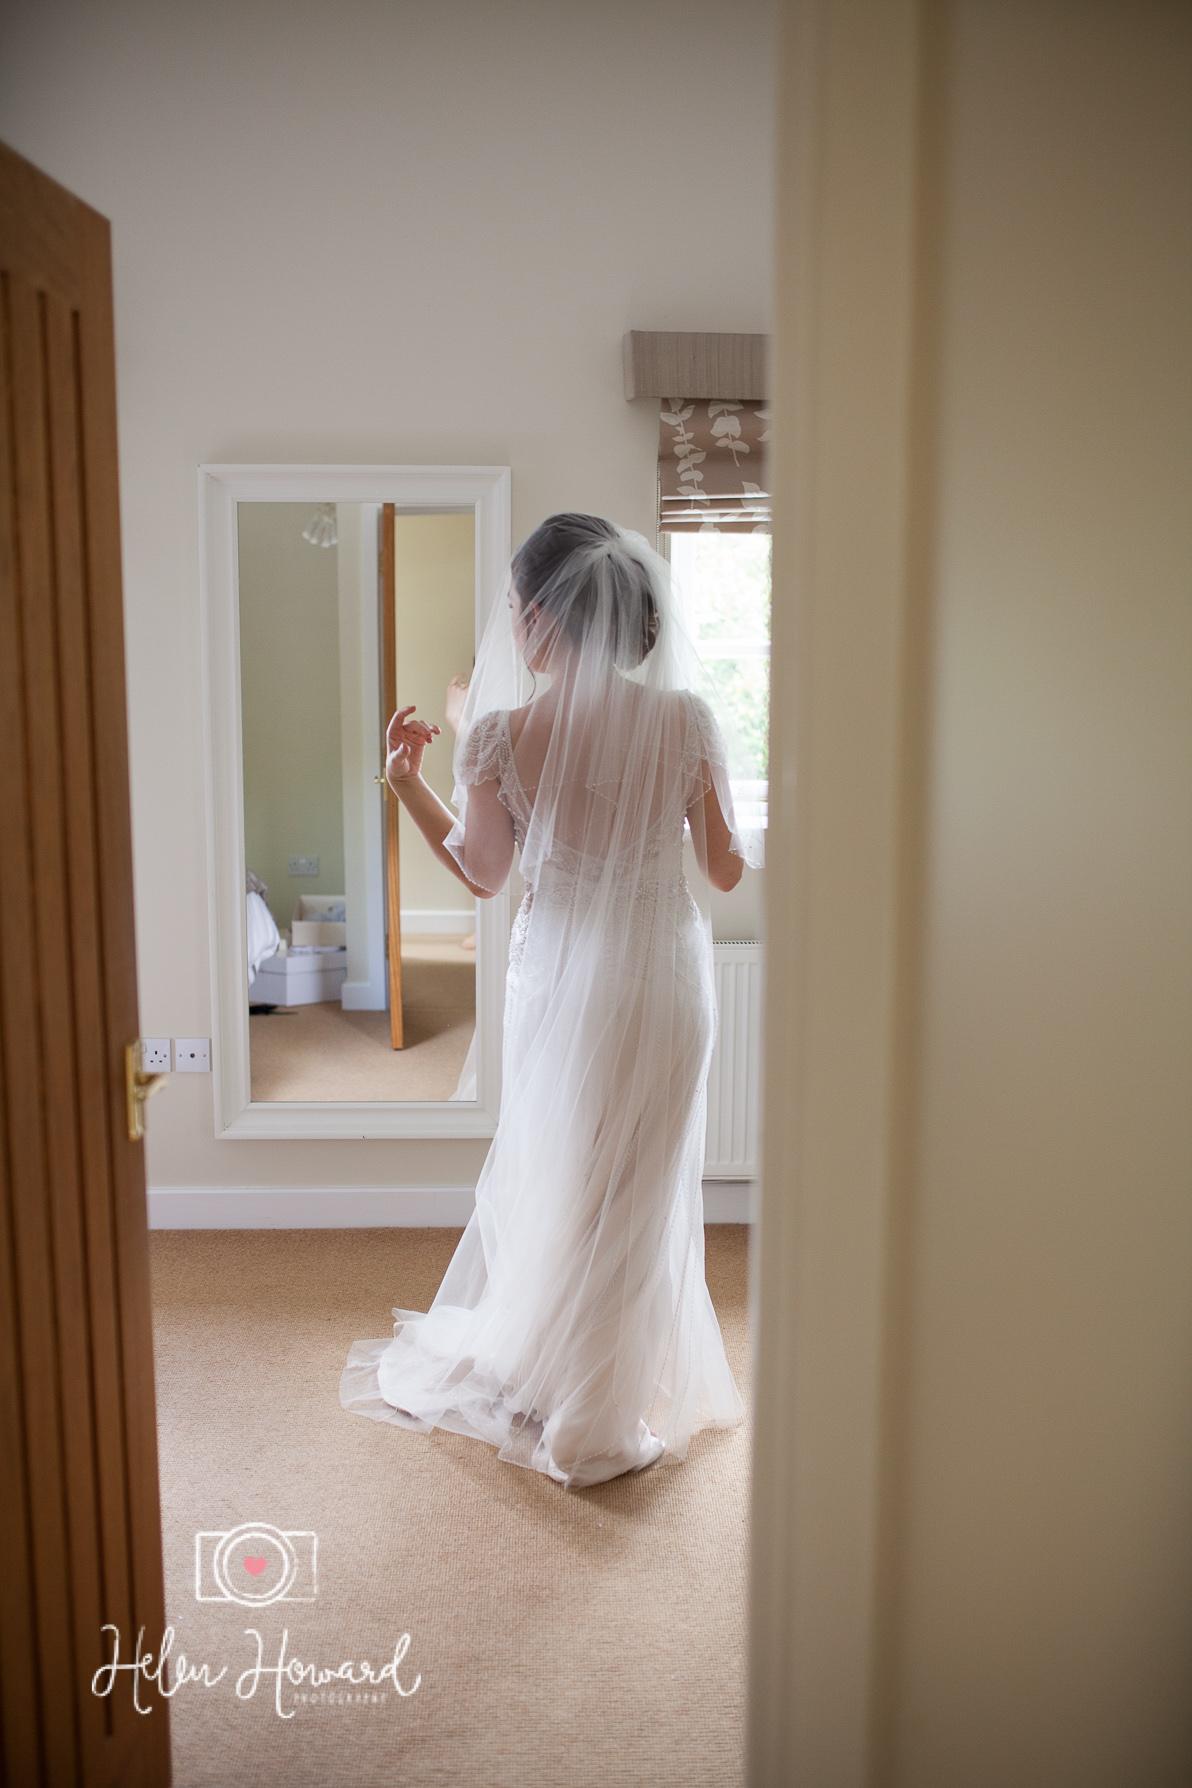 Helen Howard Photography Packington Moor Wedding-48.jpg